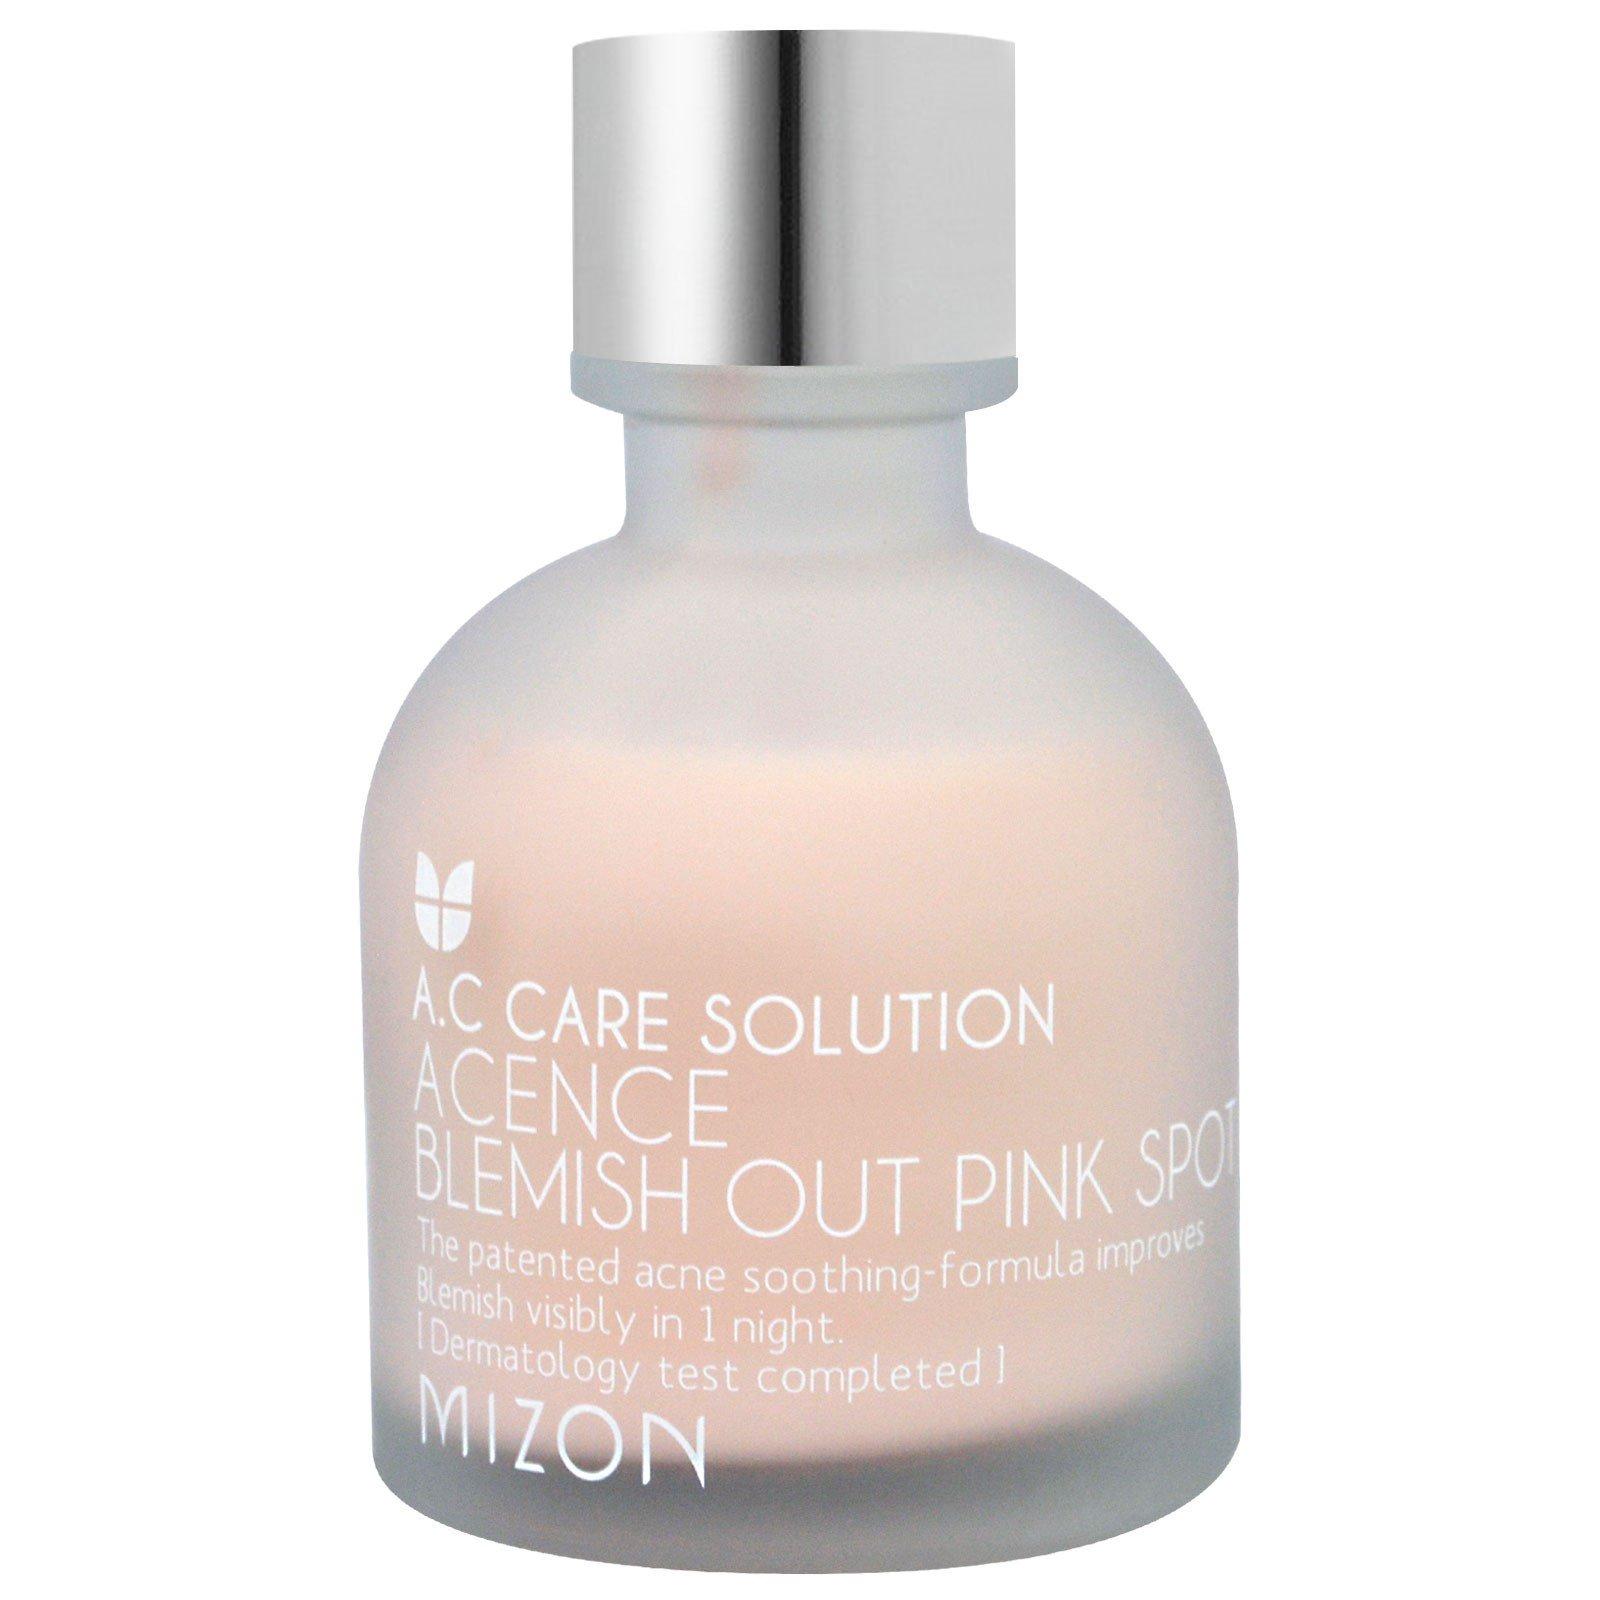 Mizon, Acence Blemish Pout Pink Spot, 1,01 унций (30 мл)